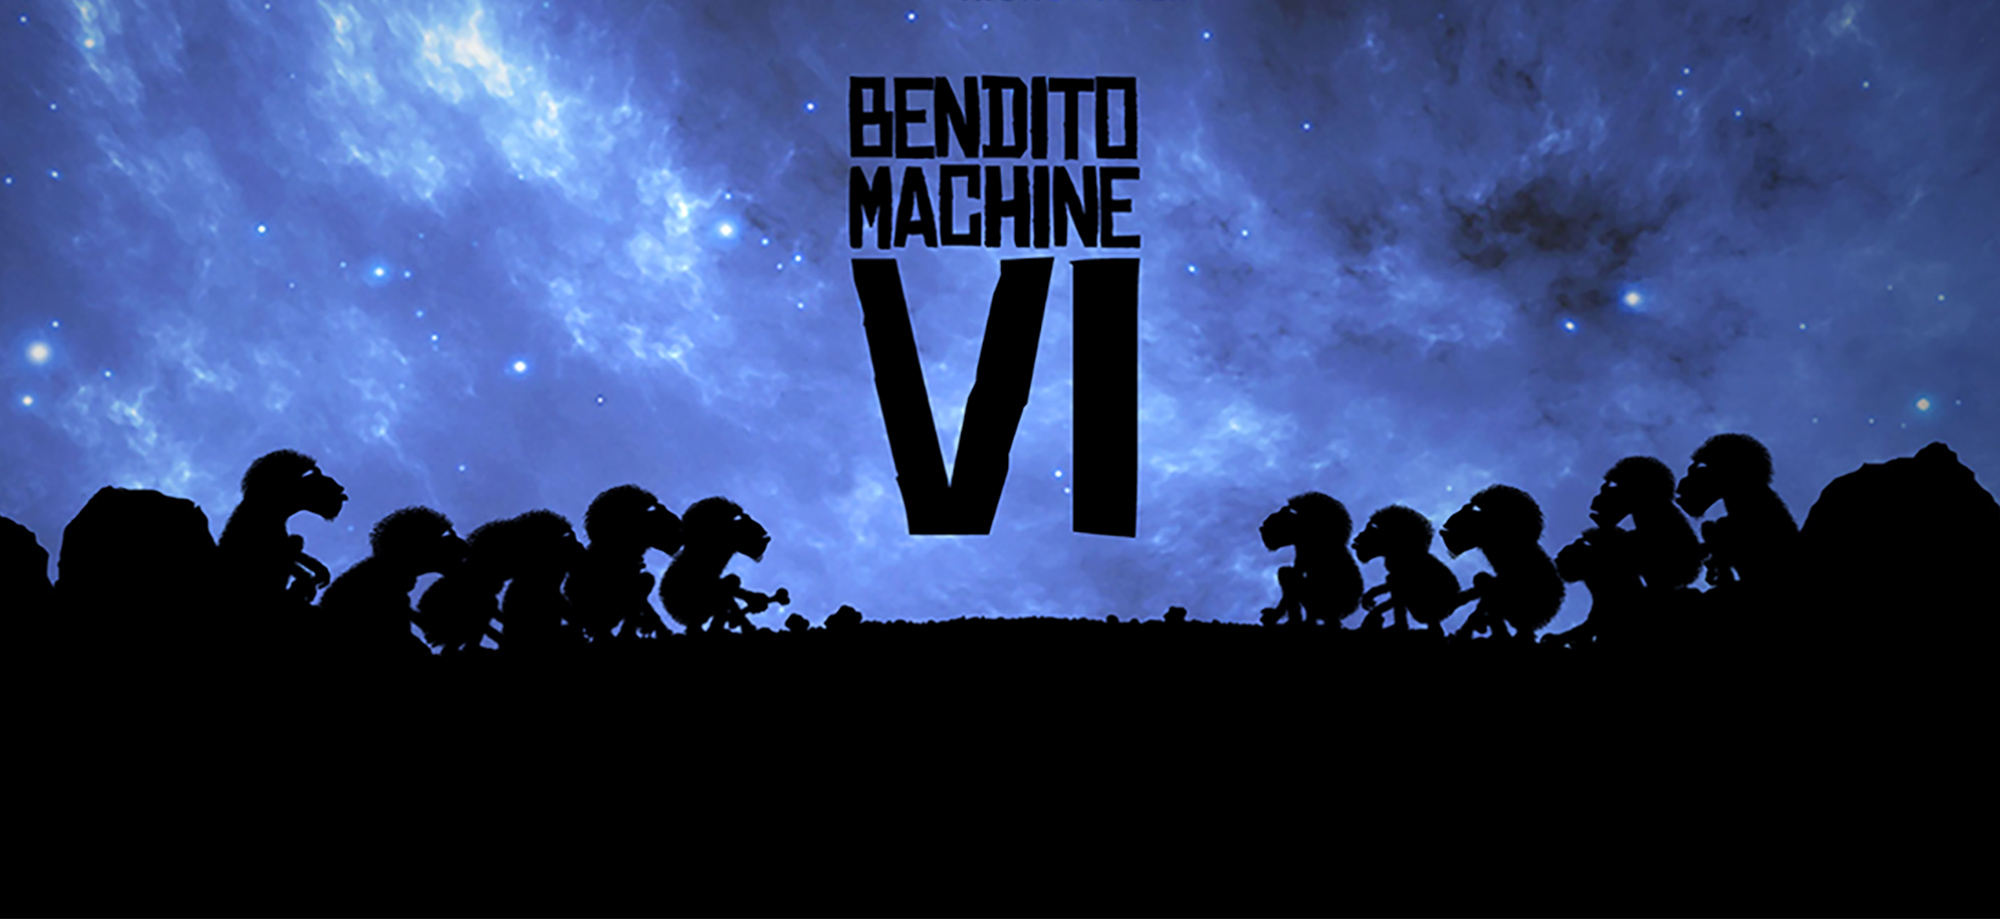 bendito_machine_6_02